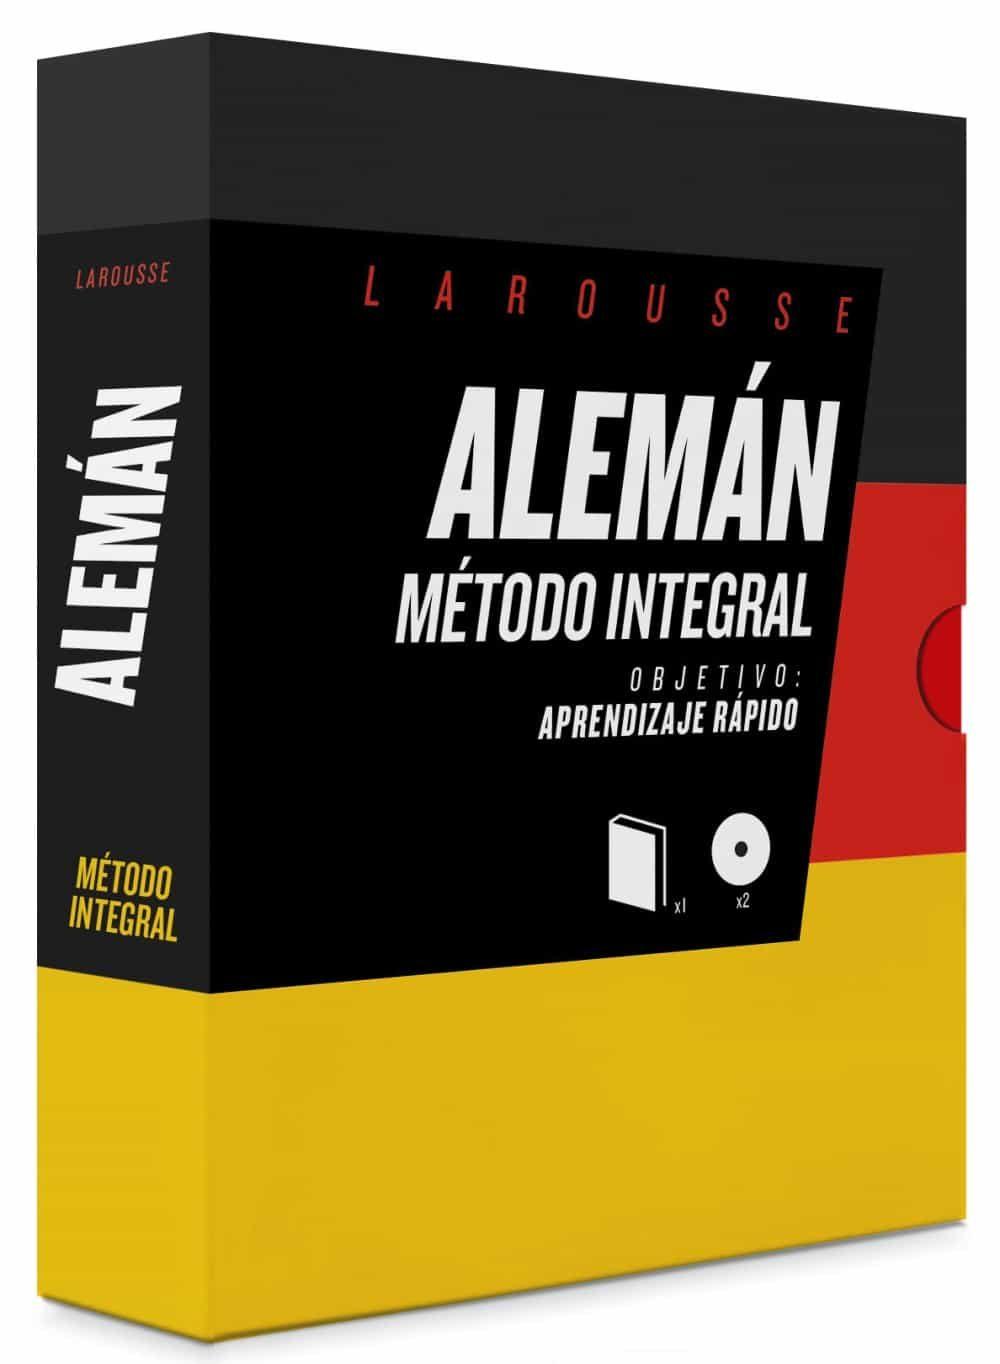 aleman: metodo integral (2ª ed.)-9788416984534